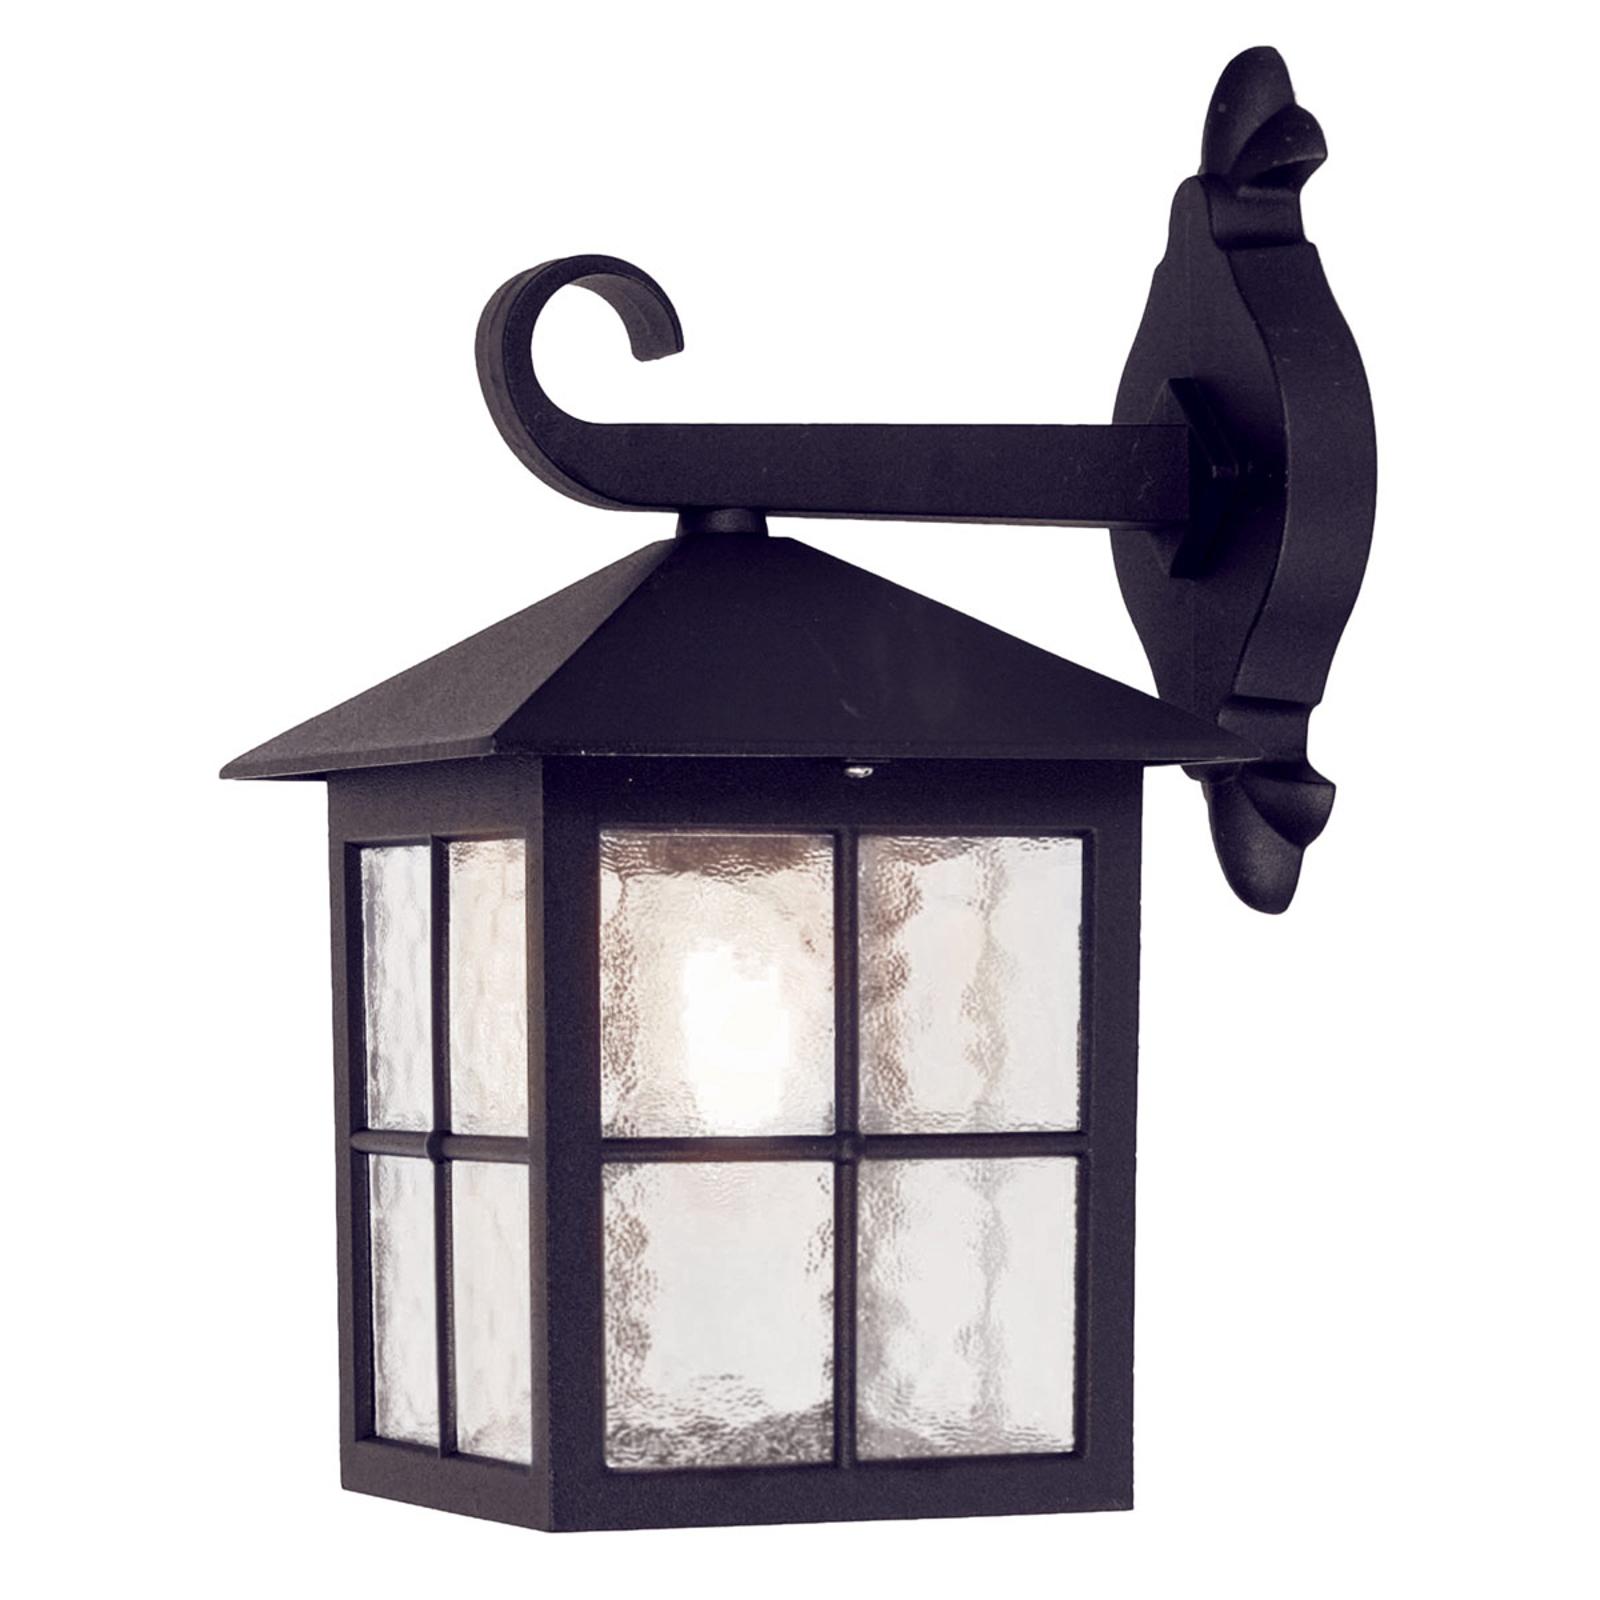 Buitenwandlamp Winchester BL18, lantaarn onder